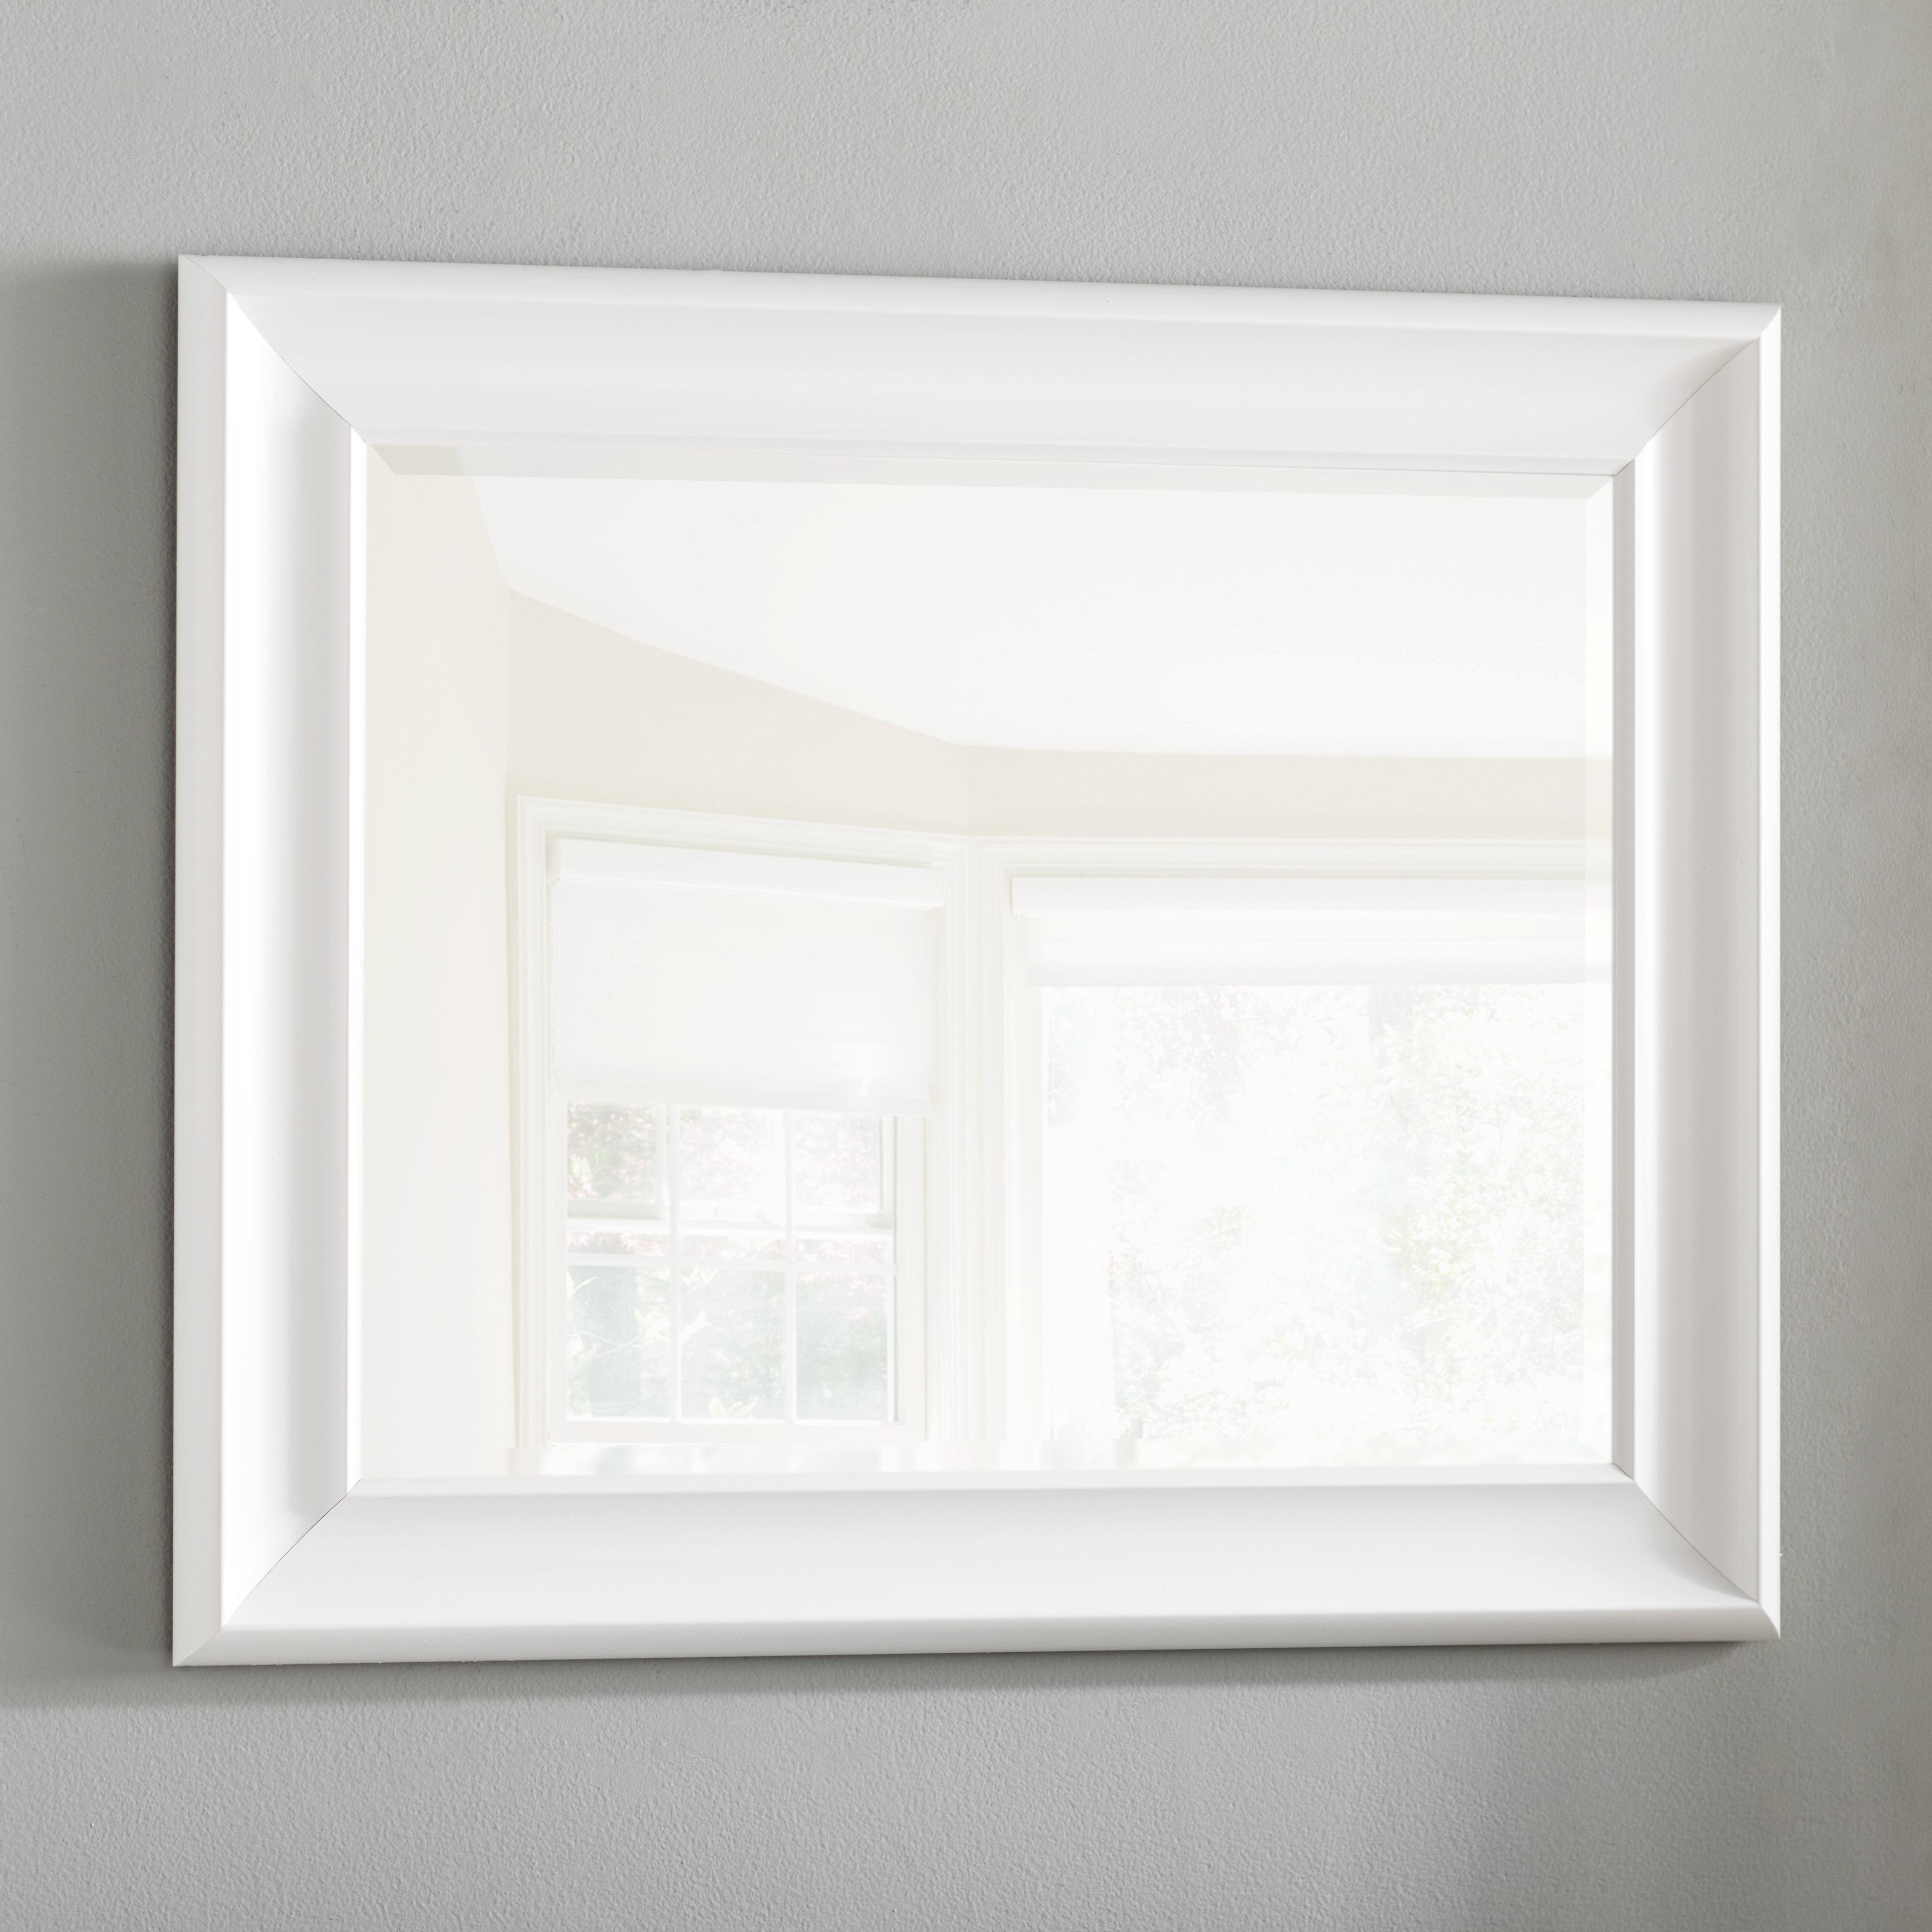 Willa Arlo Interiors Northcutt Accent Mirror & Reviews   Wayfair Intended For Northcutt Accent Mirrors (View 2 of 30)